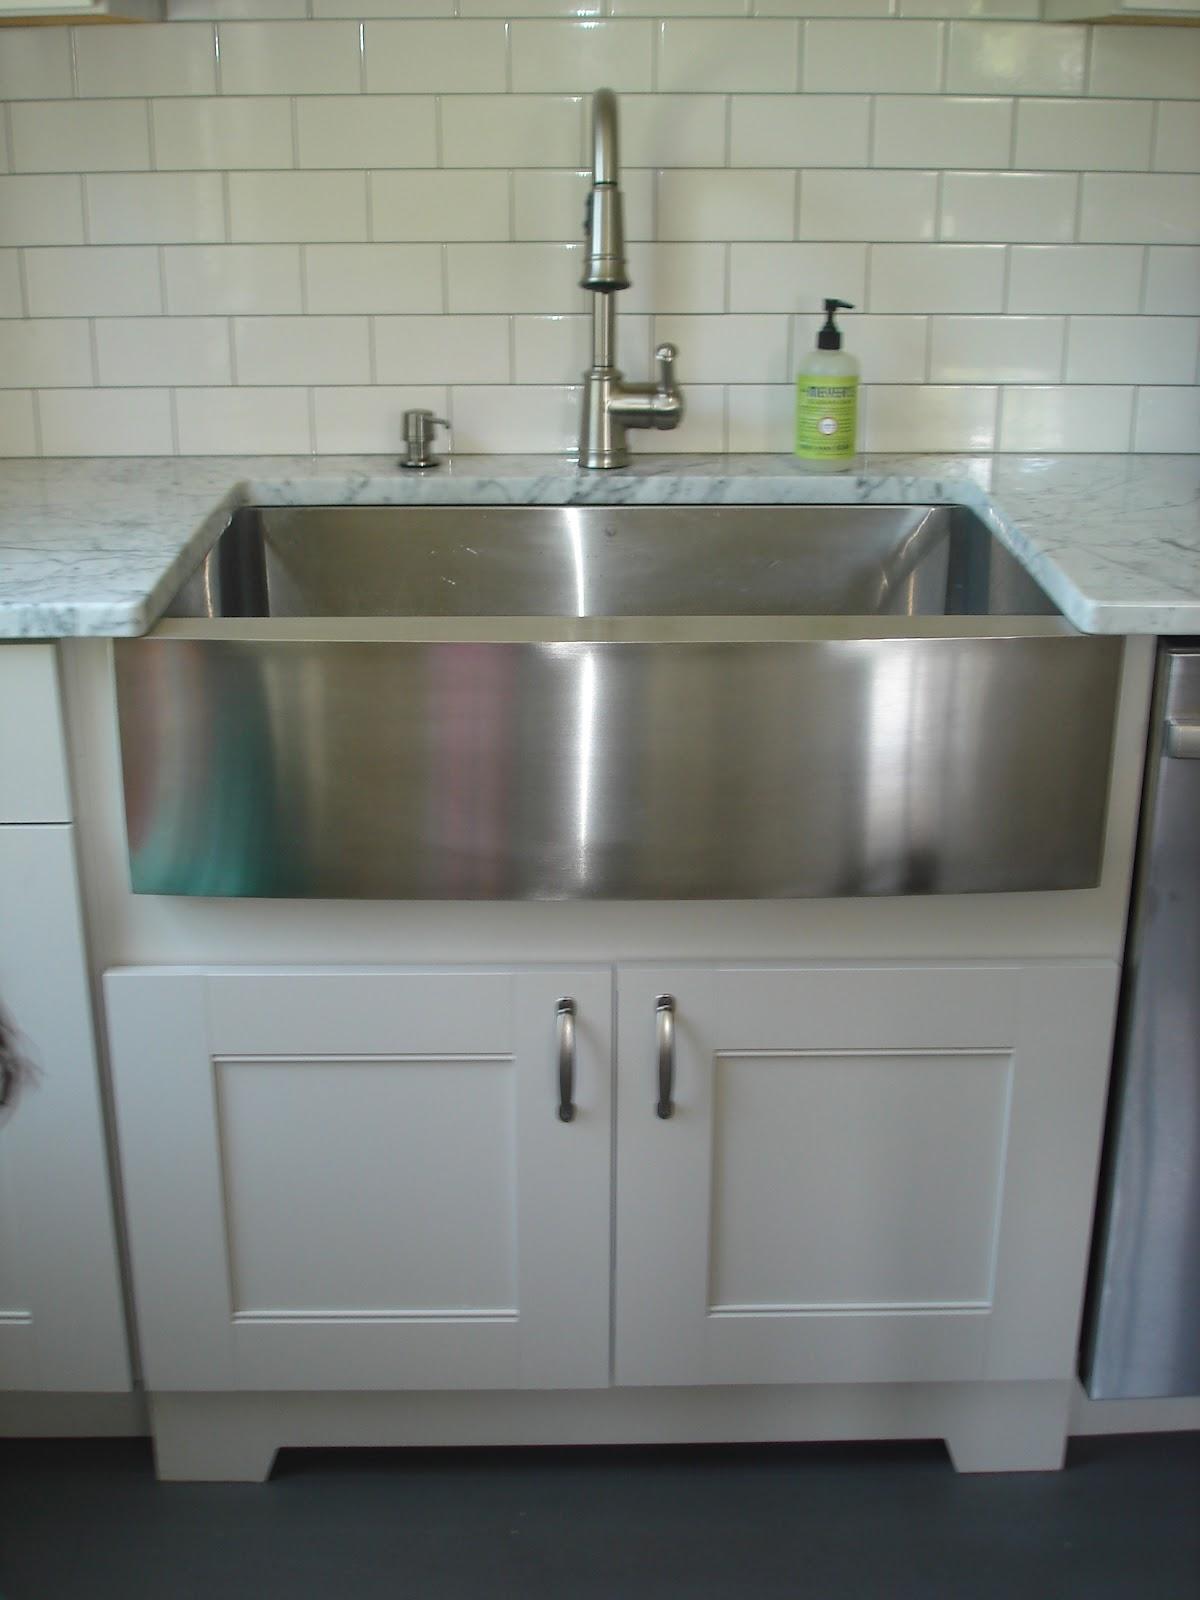 Inexpensive Kitchen Backsplash Booth Table Lush Life: House Renovation Part Ii -